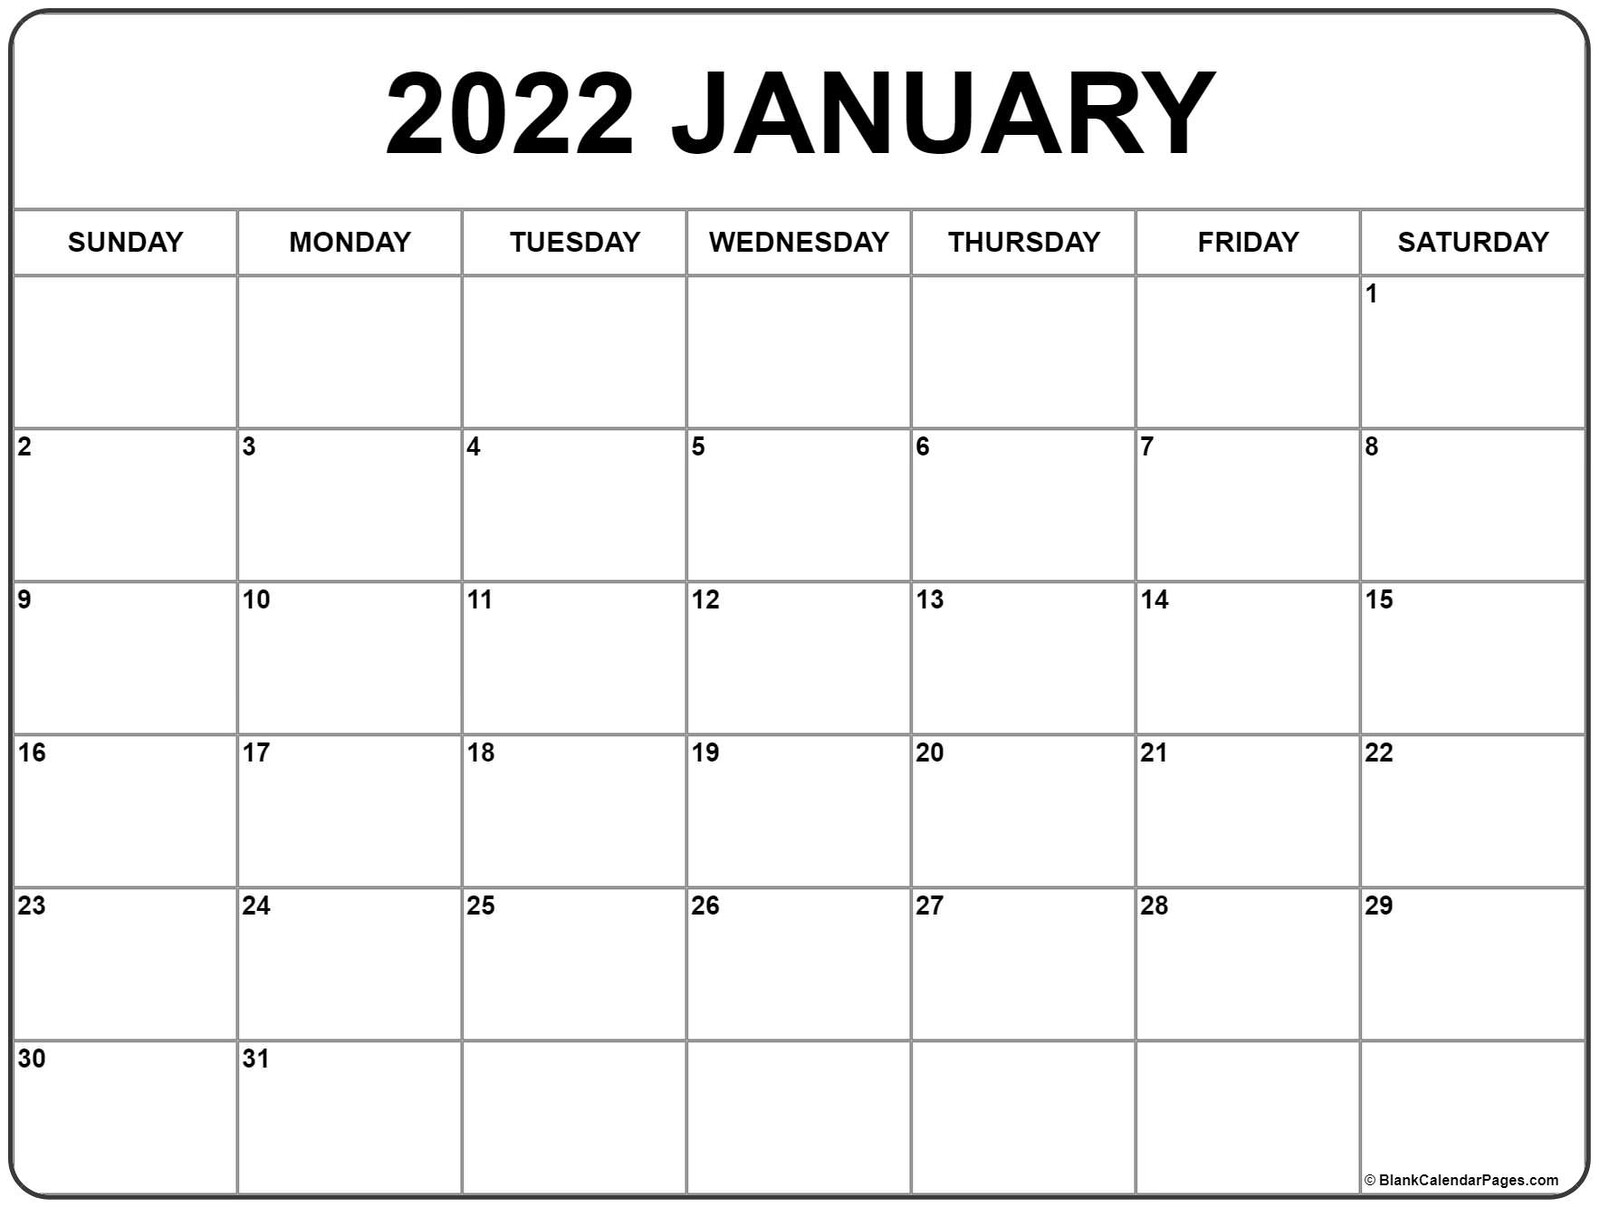 Blank Calendar Pages January 2022 calendar | free printable calendar